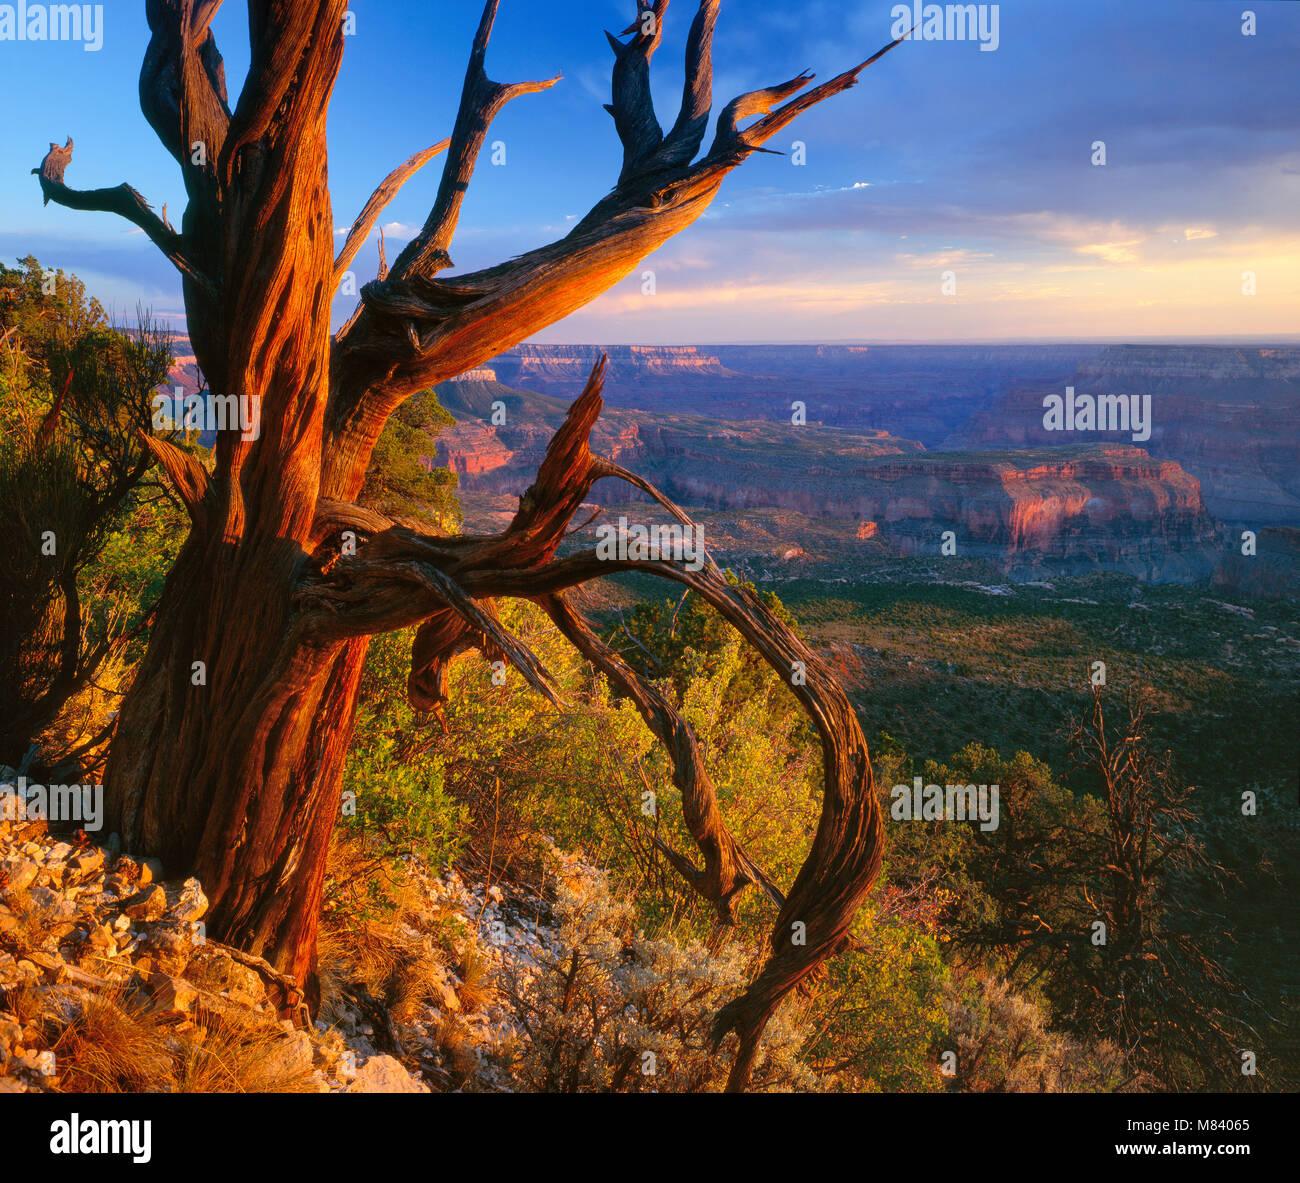 Crazy Jug Point, North Rim, Grand Canyon National Park, Arizona - Stock Image